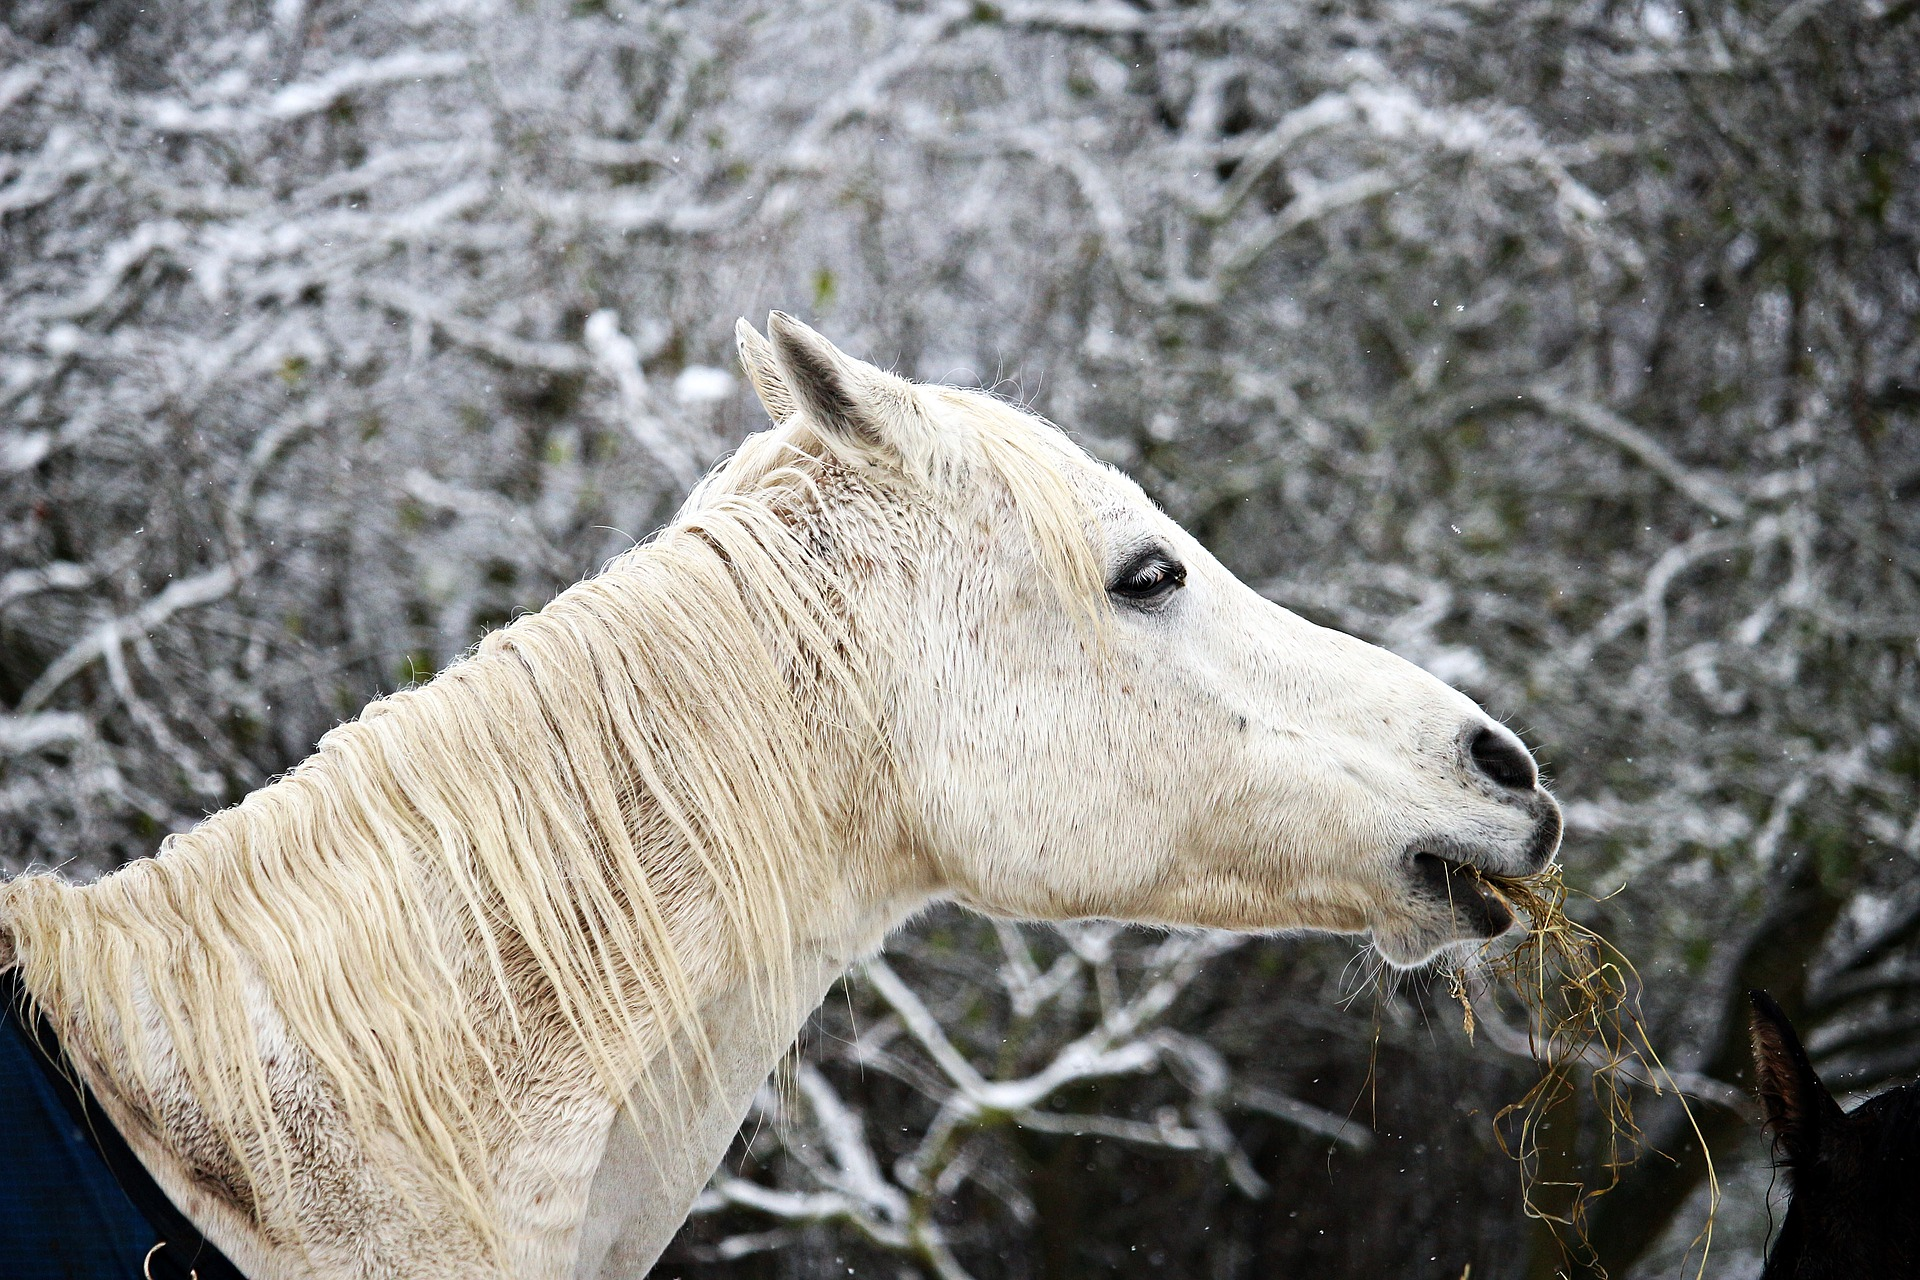 horse-1811809_1920.jpg